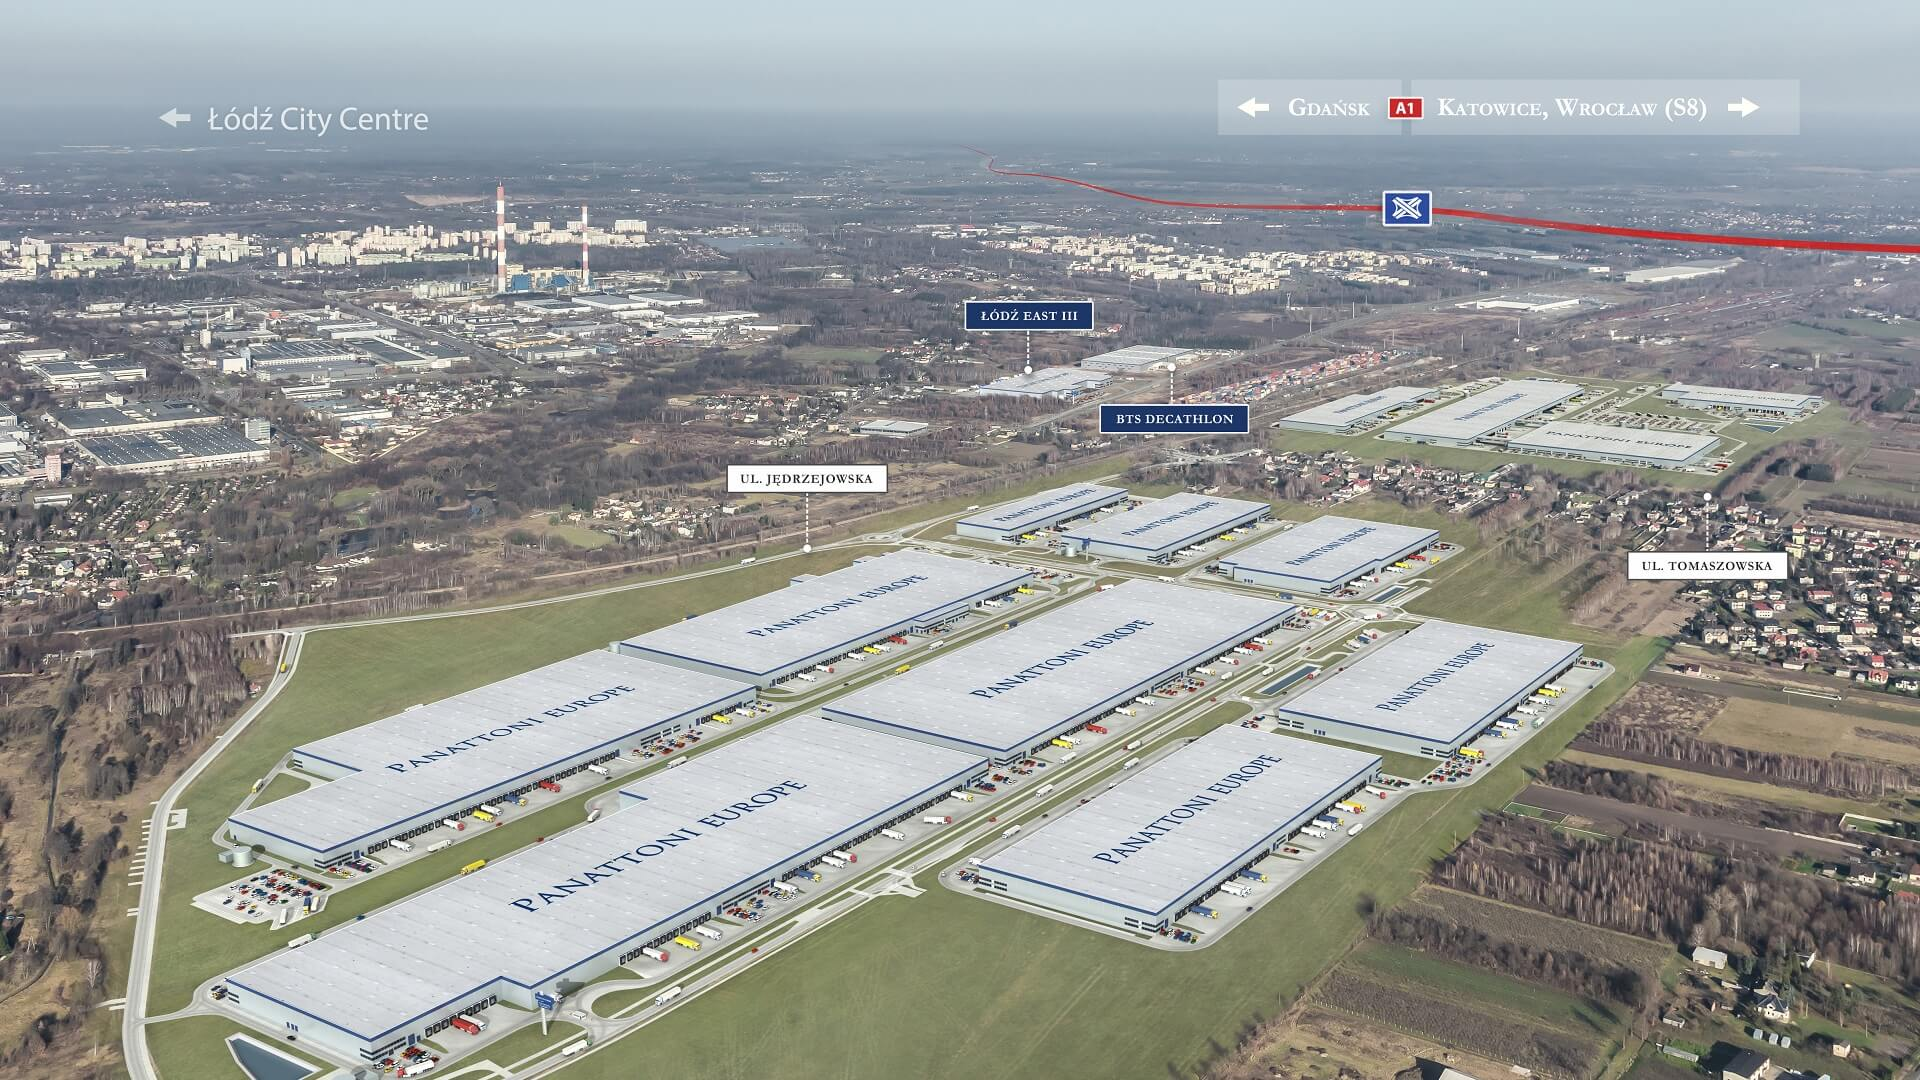 Lodz central logistics hub by Panattoni Europe